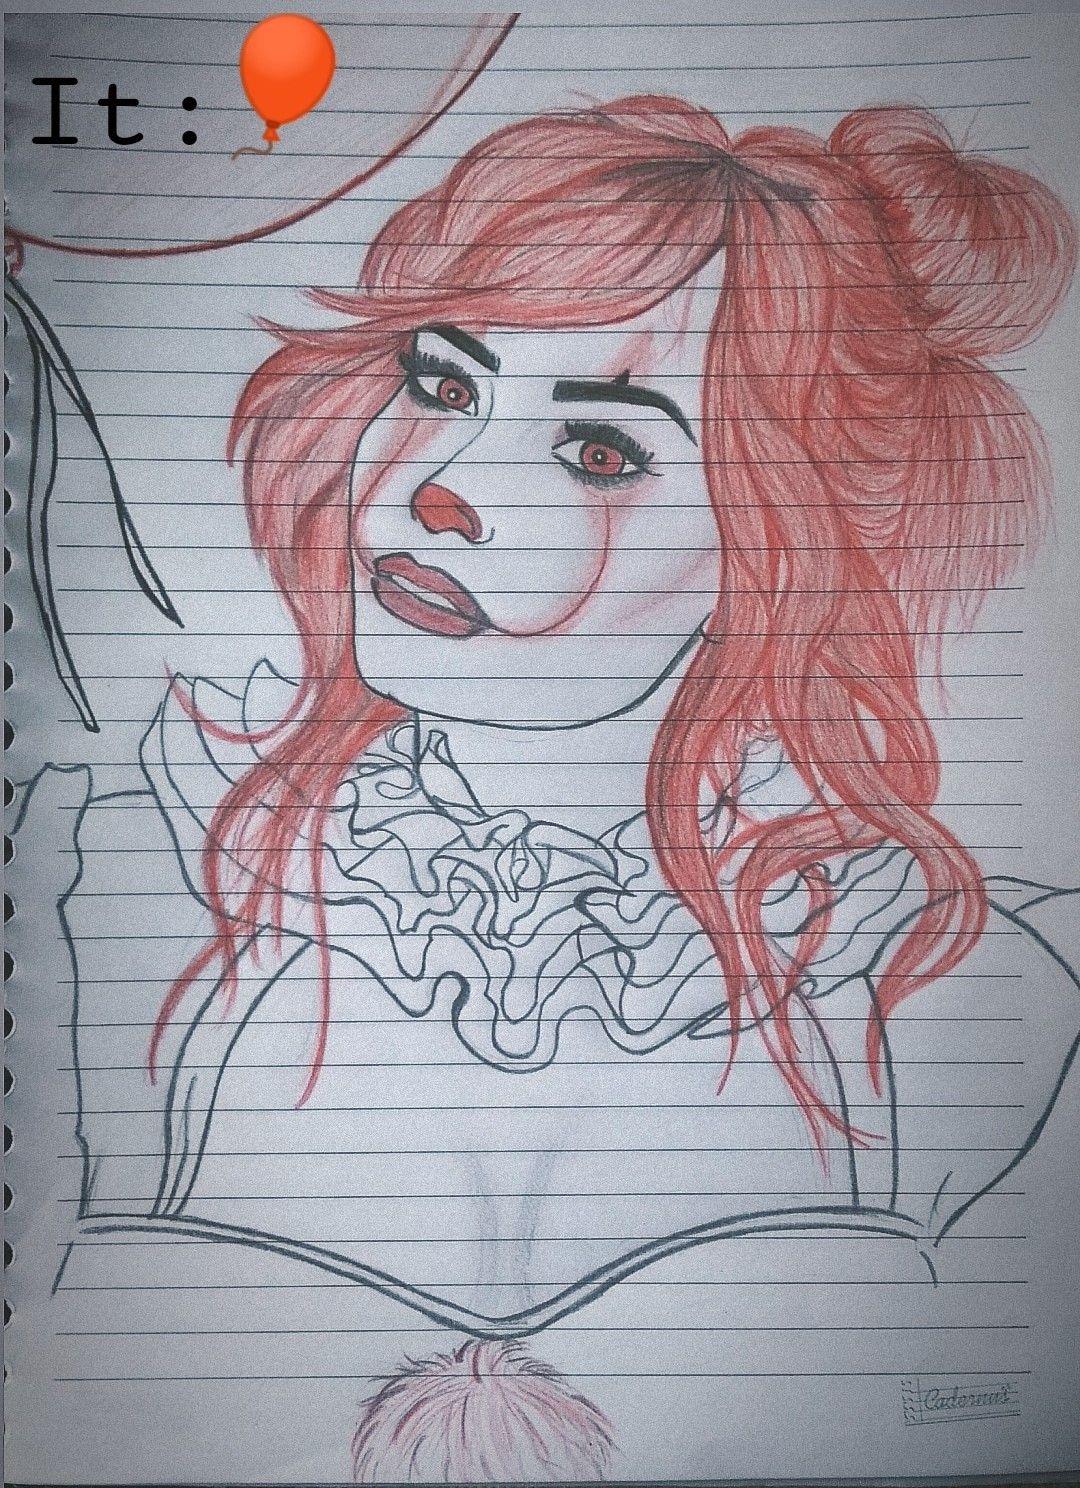 Demi Lovato It A Coisa Fanart Desenhos Para Colorir Ladybug Fanart Desenhos